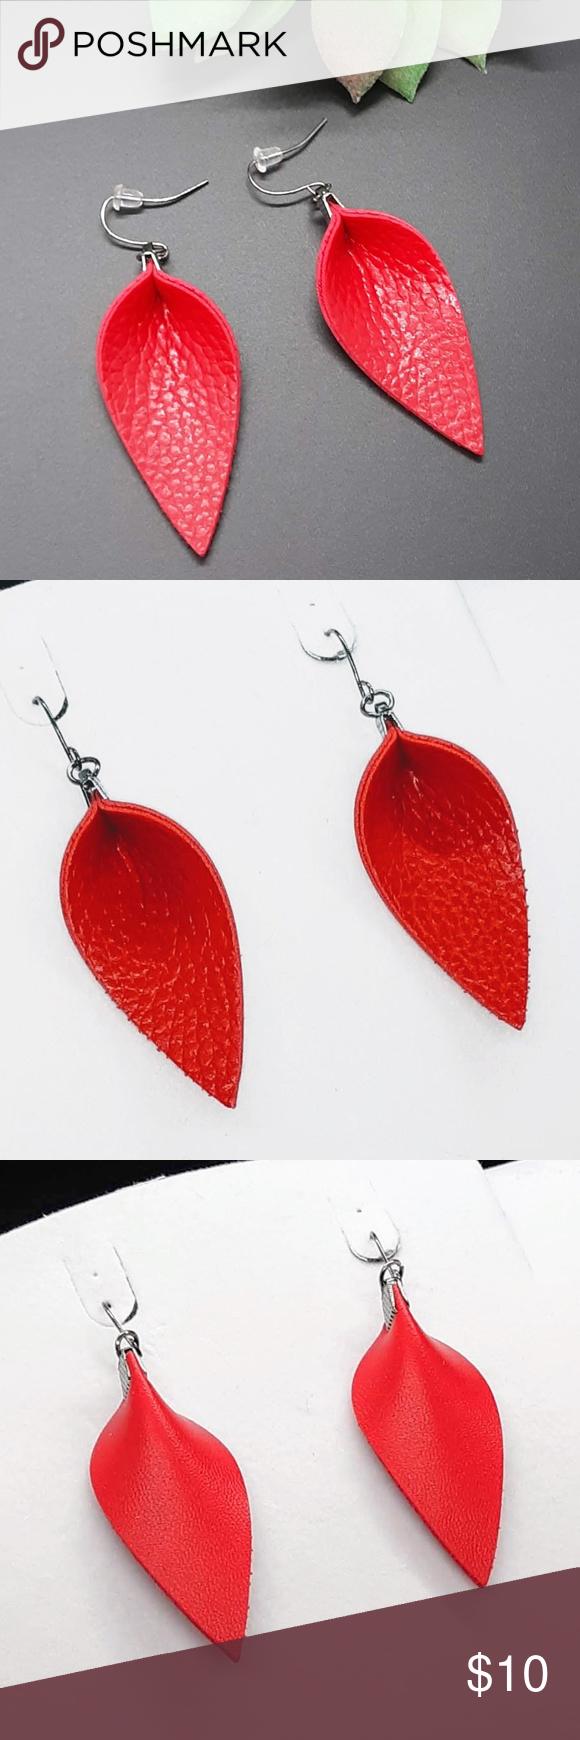 Textured Leather Teardrop Earrings Red Teardrop Earrings Teardrop Shape Earrings